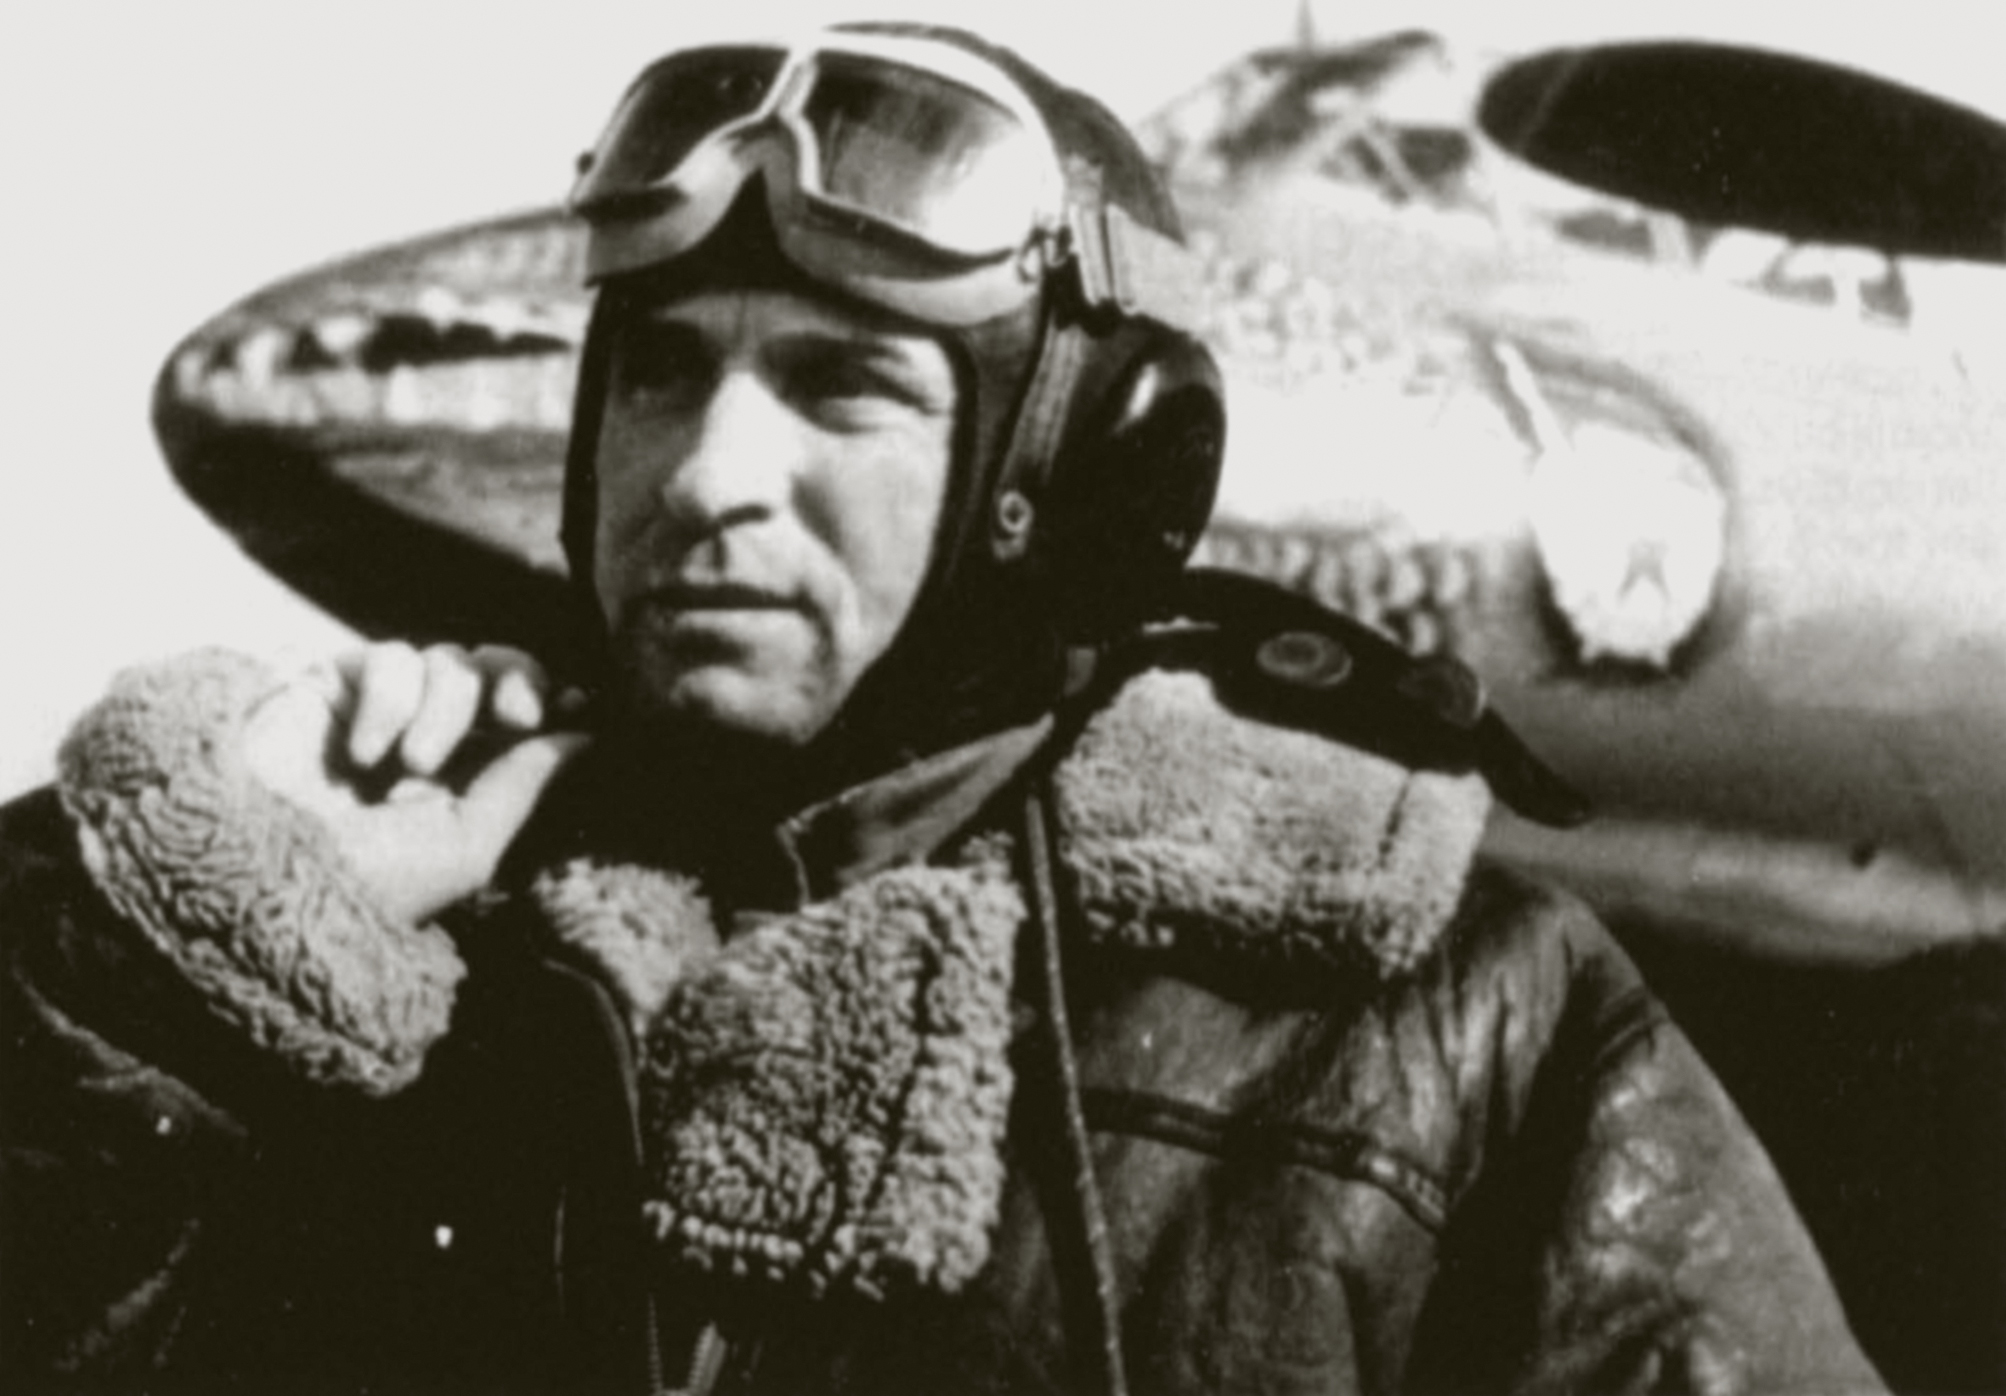 Petlyakov Pe 2 type 359 1GvBAD with crocodile mouth and VVS pilot Russia 01